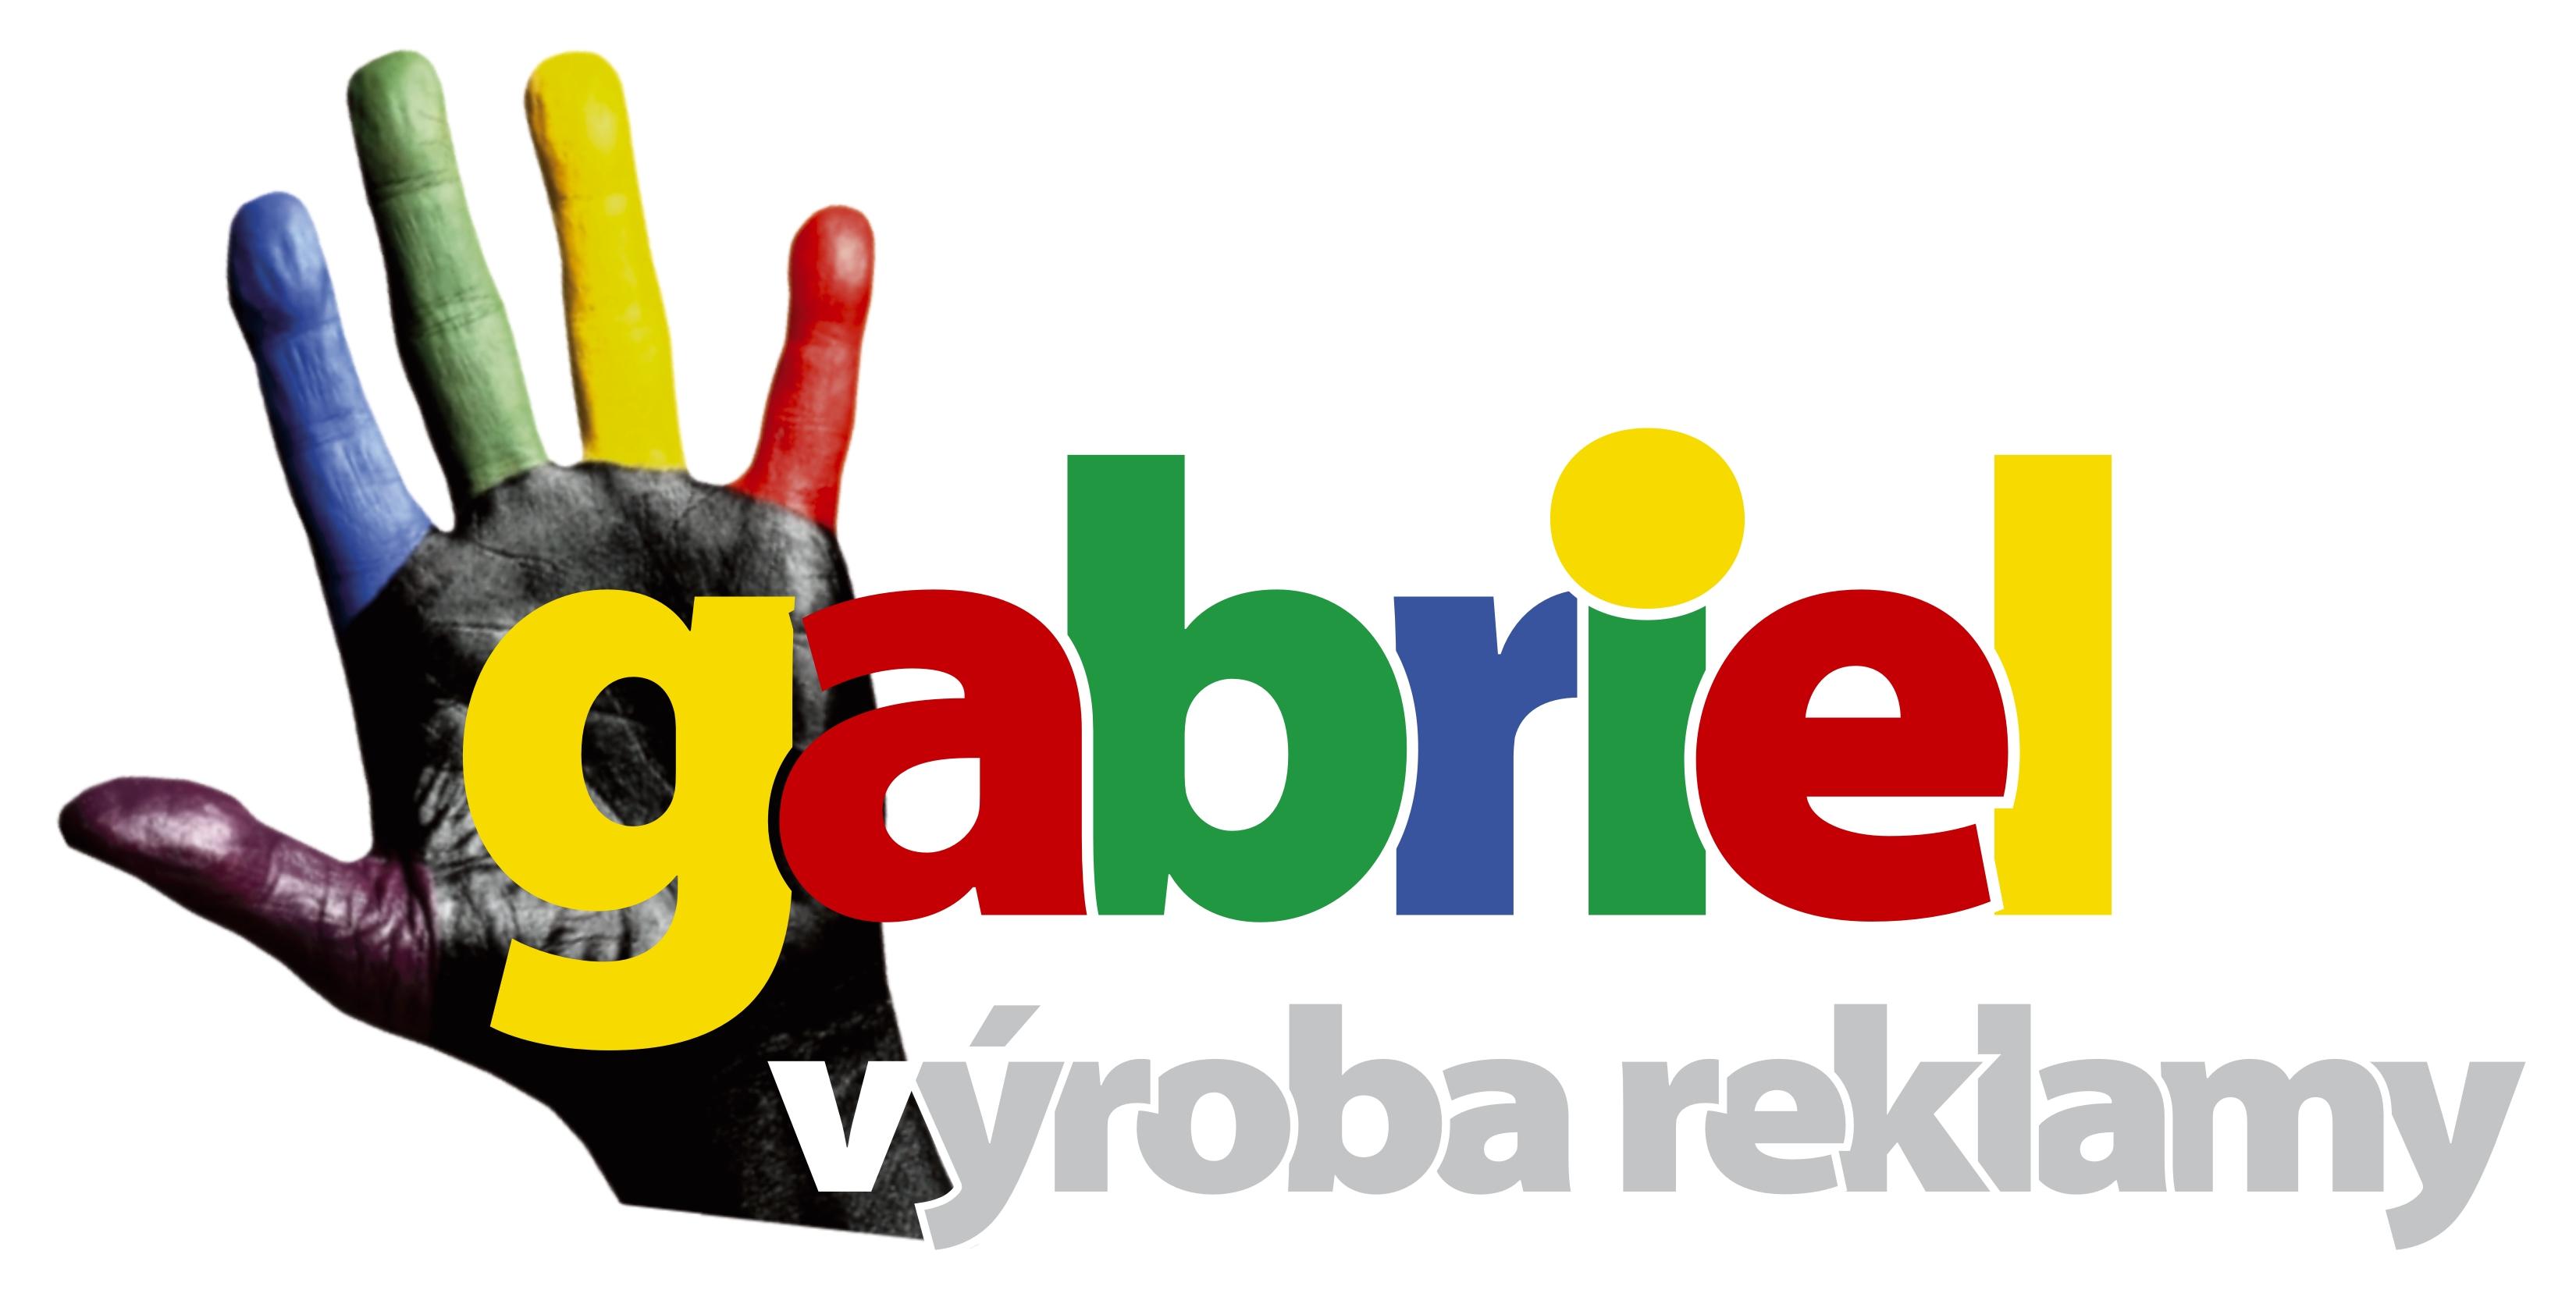 GABRIEL reklamní agentura – Mgr. Tomáš Baierl